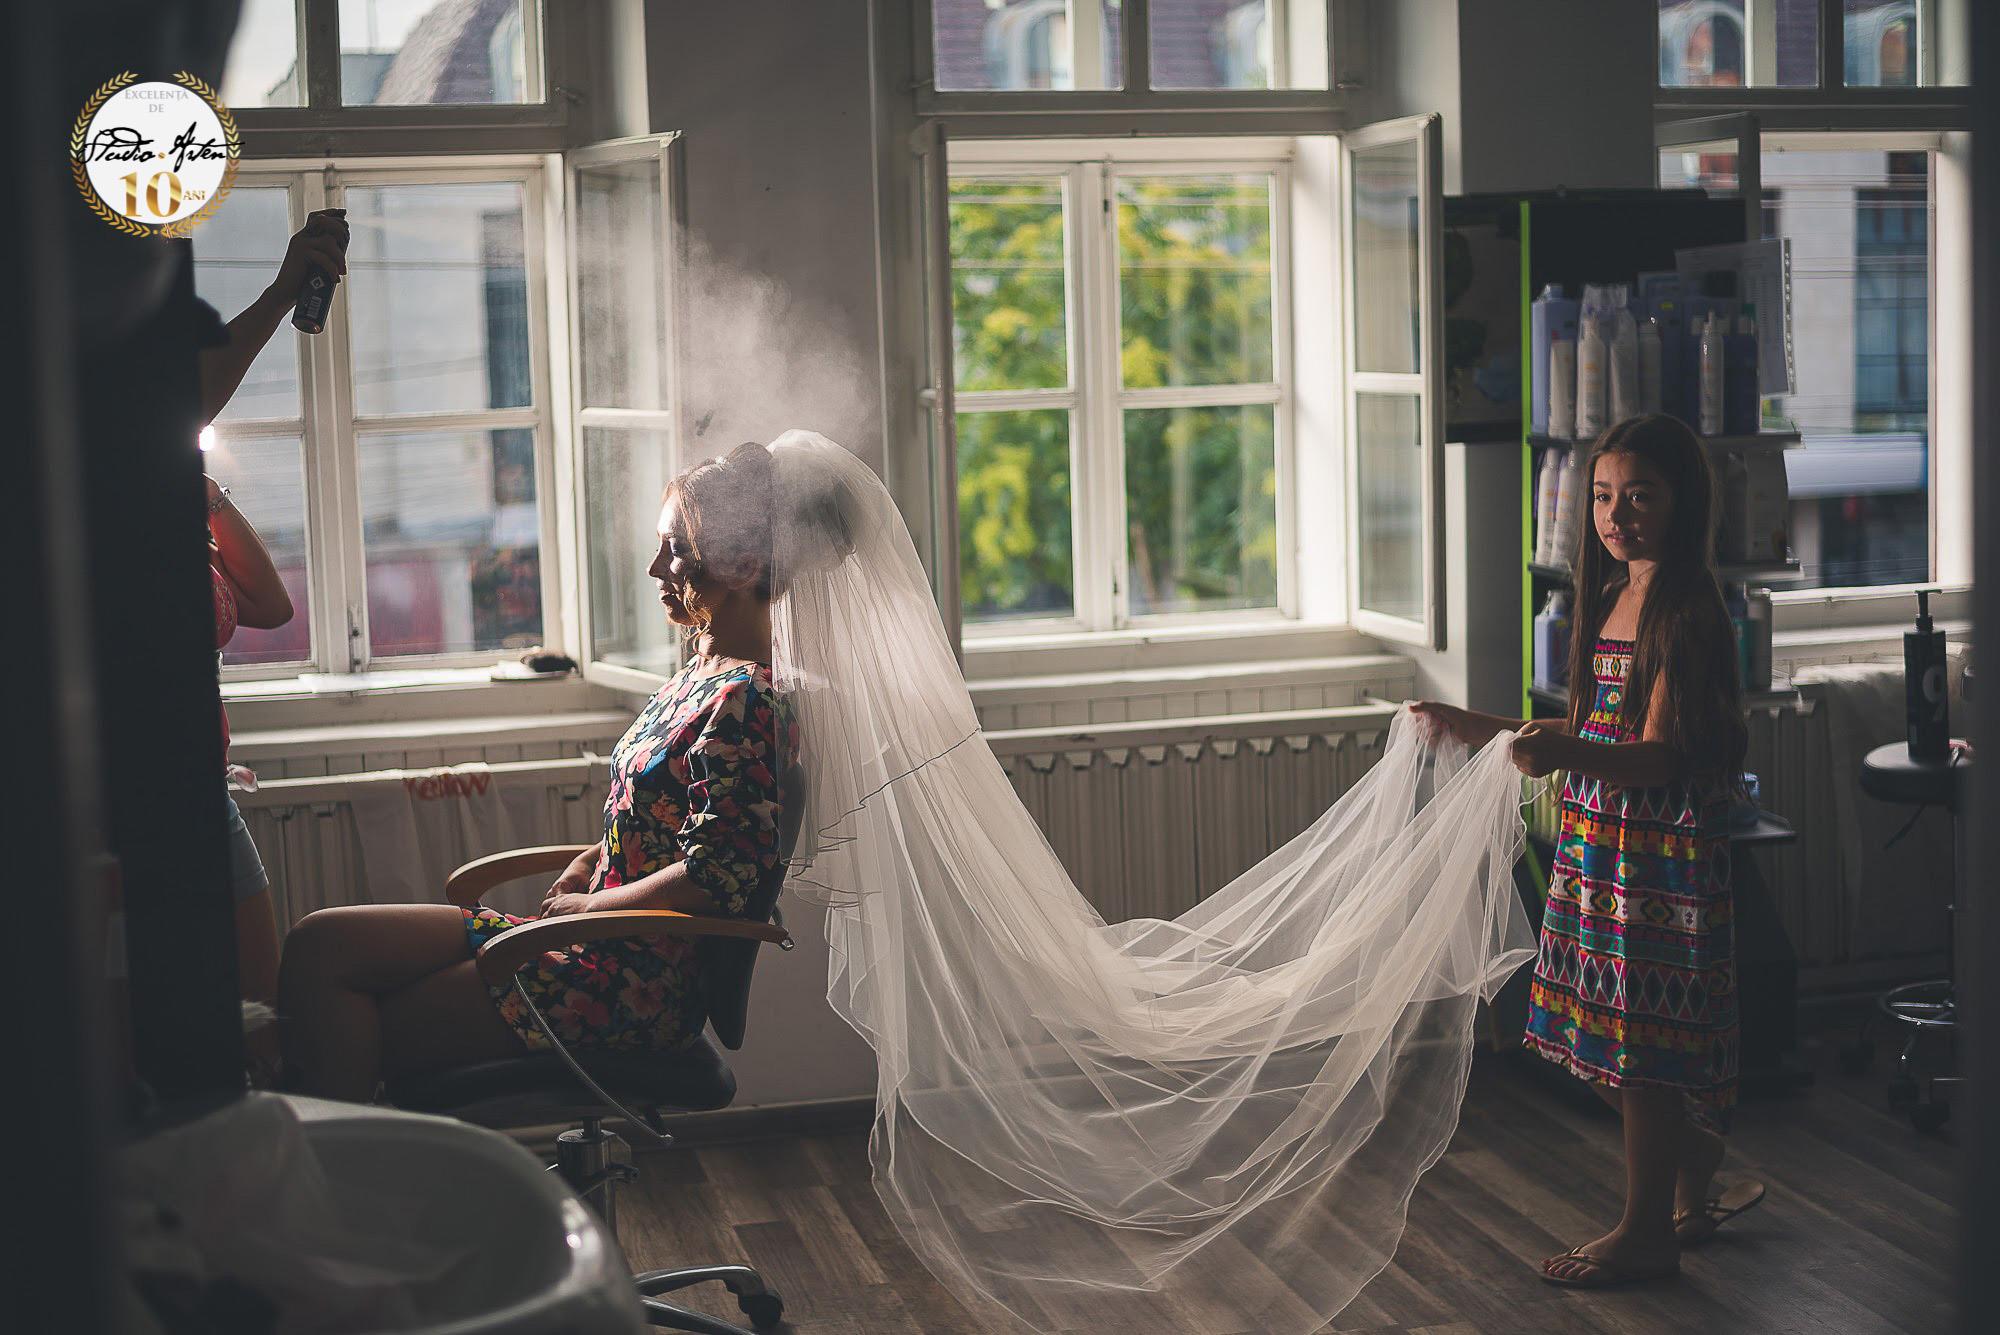 vFotograf nunta mures, fotografii de nunta, sedinta foto nunta, foto logodna, foto nunta, poze nunta, trash the dress, album nunta personalizat, Studio Arten